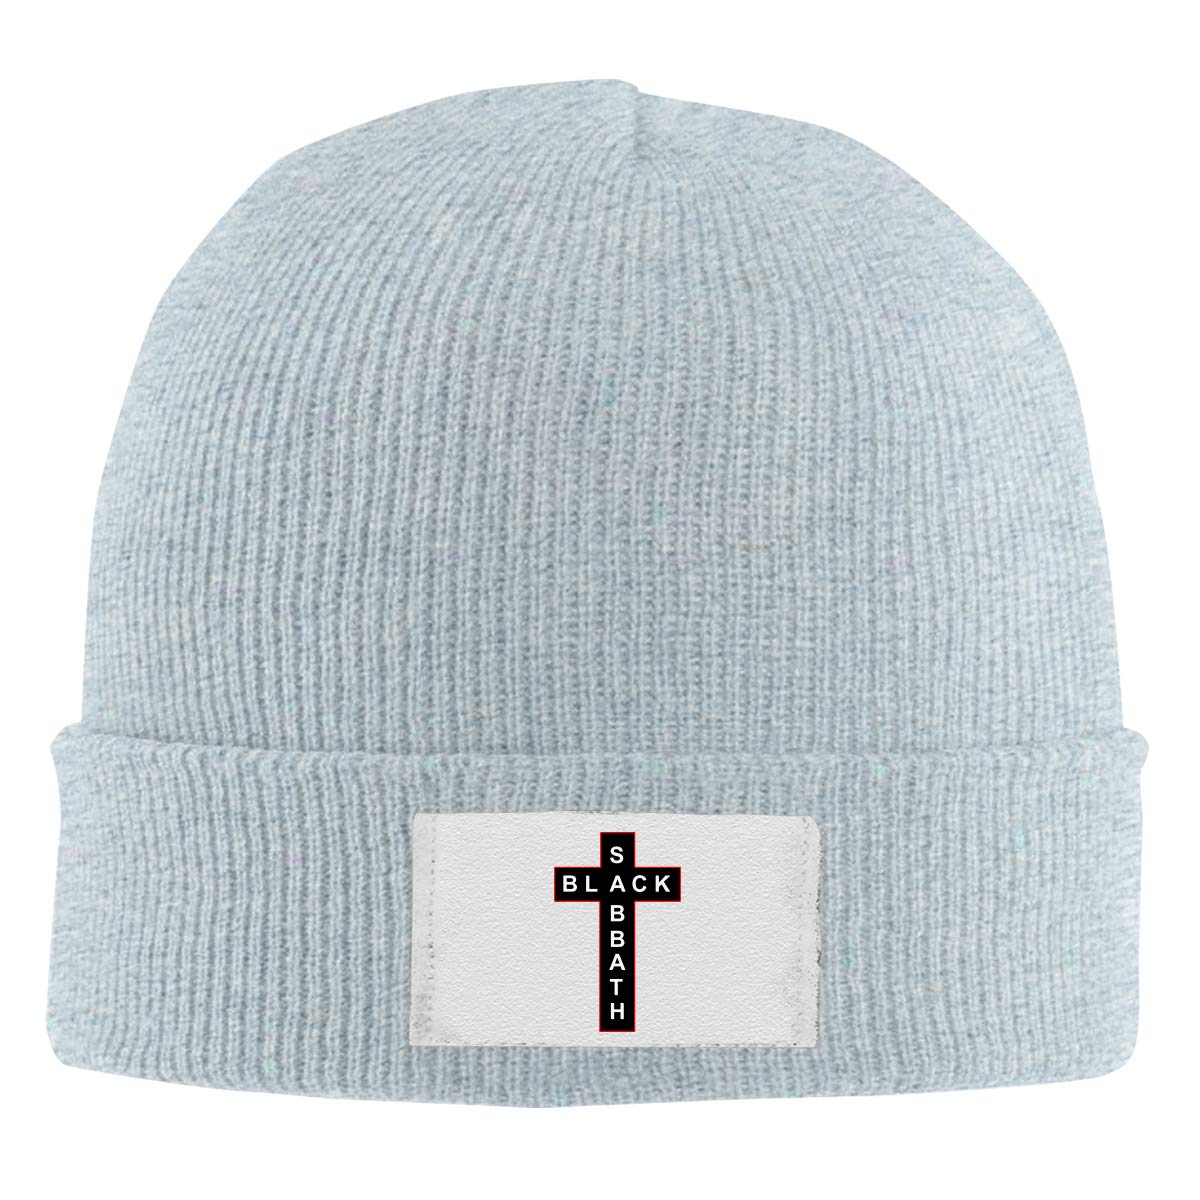 Stretchy Cuff Beanie Hat Black Dunpaiaa Skull Caps 31181821/_944 Winter Warm Knit Hats